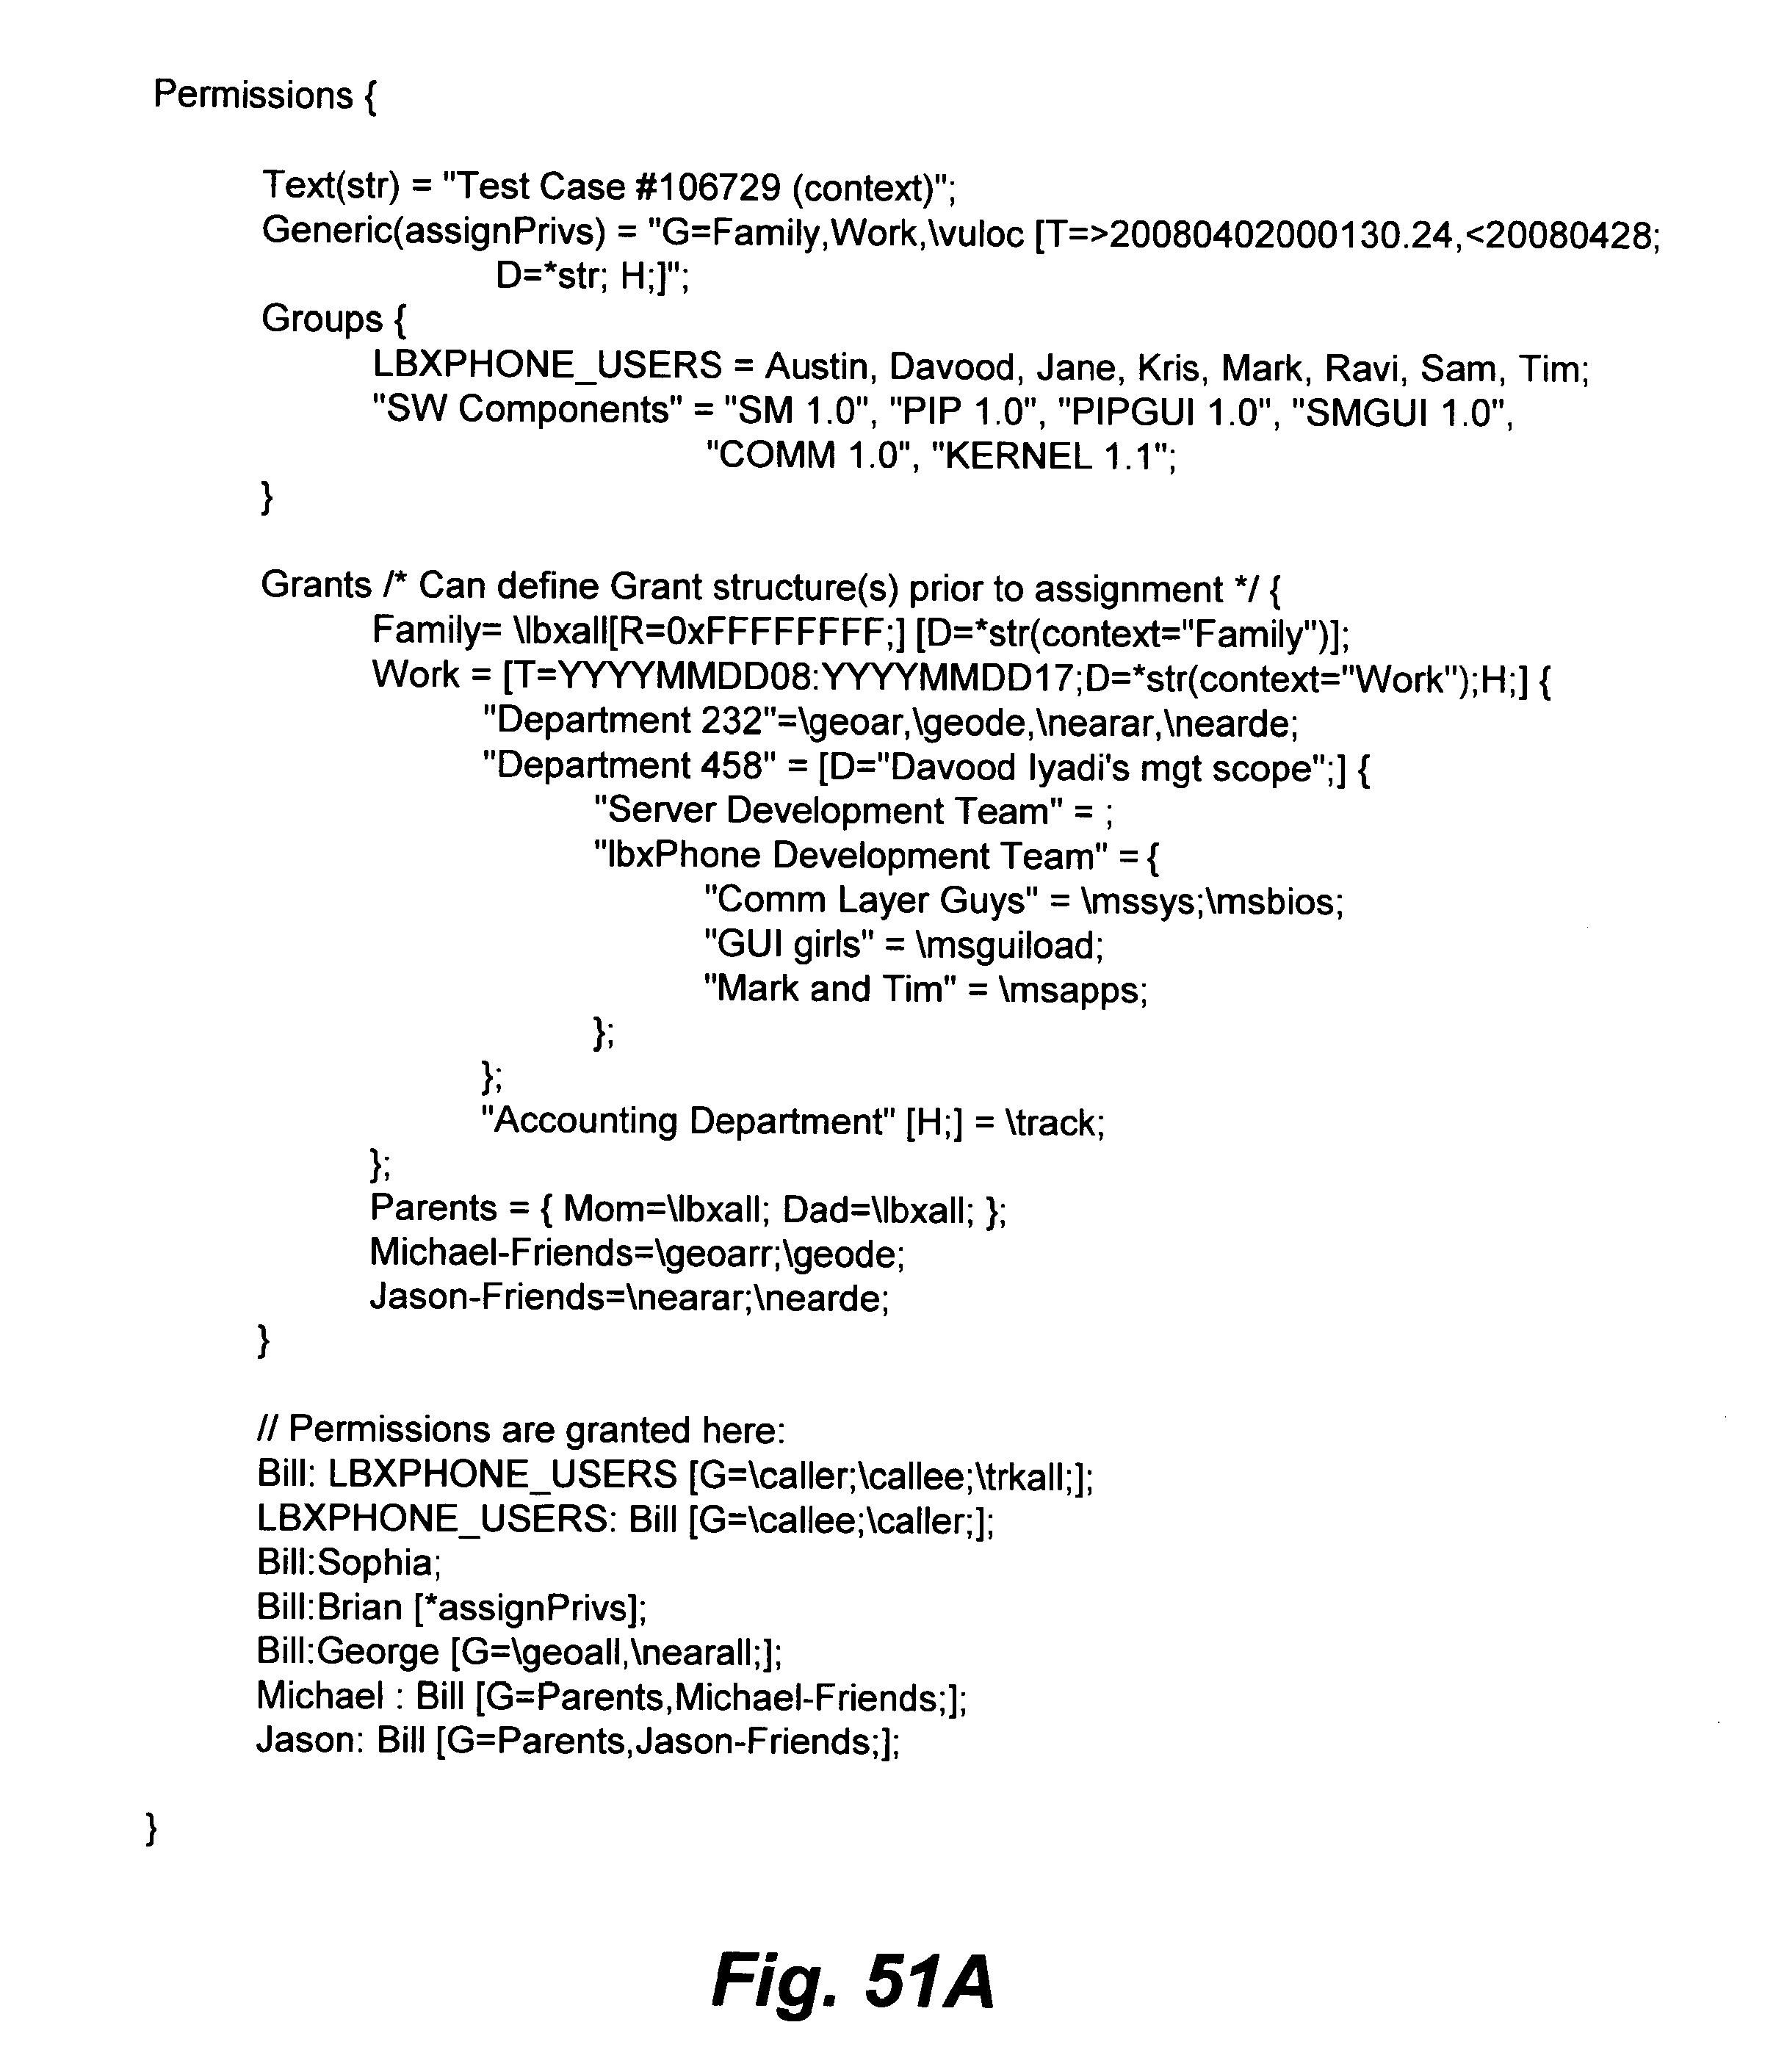 Patent US 8,923,806 B2